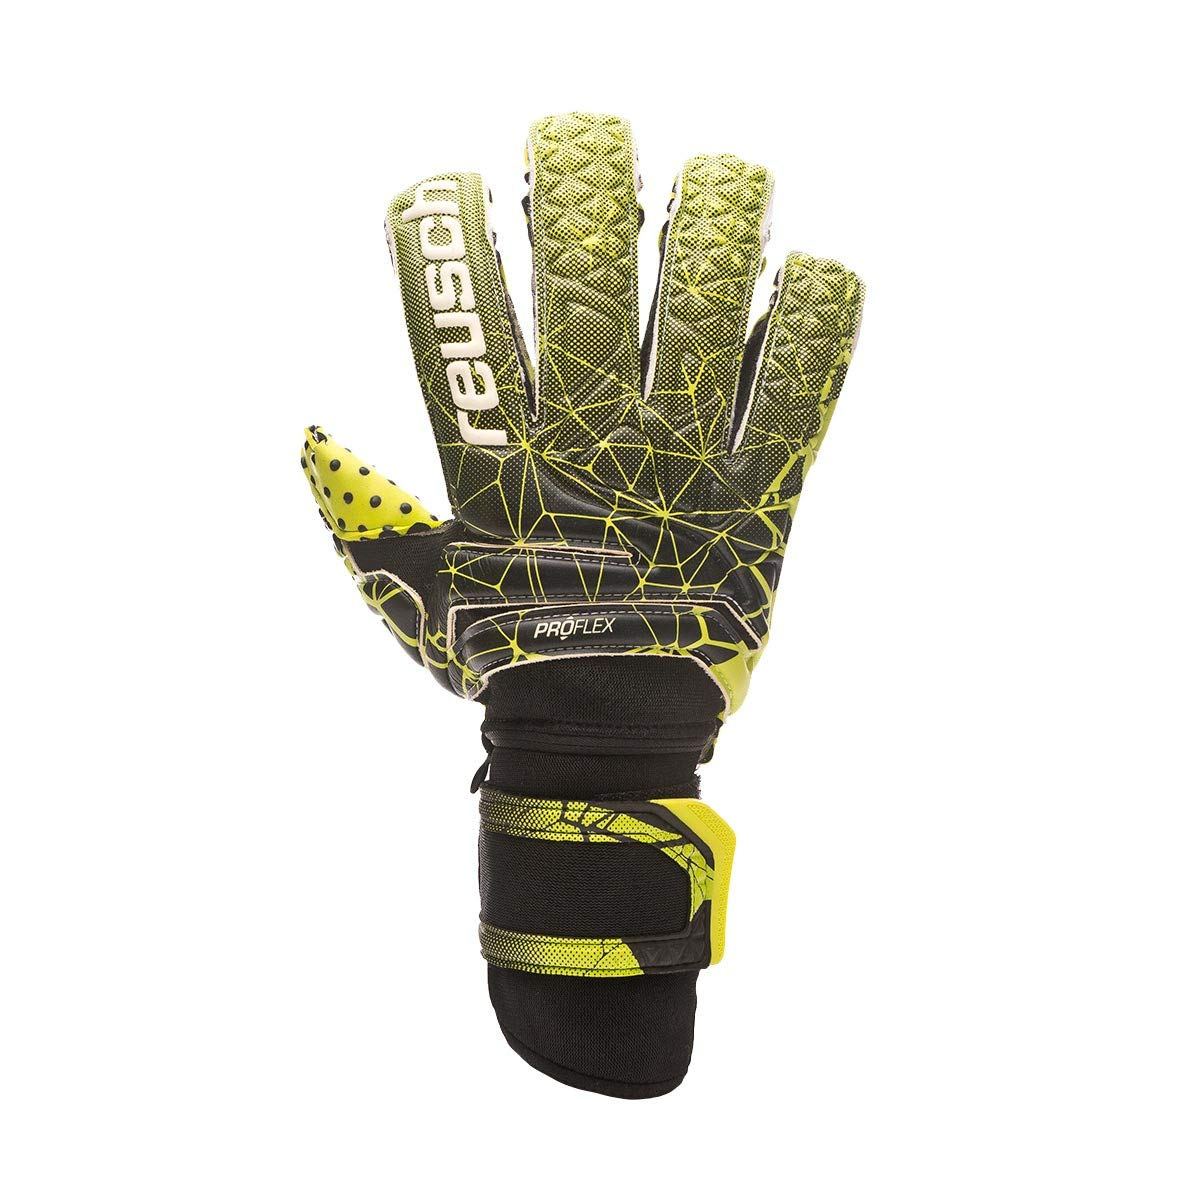 Reusch Fit Control Pro G3 SpeedBump Evo Ortho tec ゴールキーパーグローブ サイズ